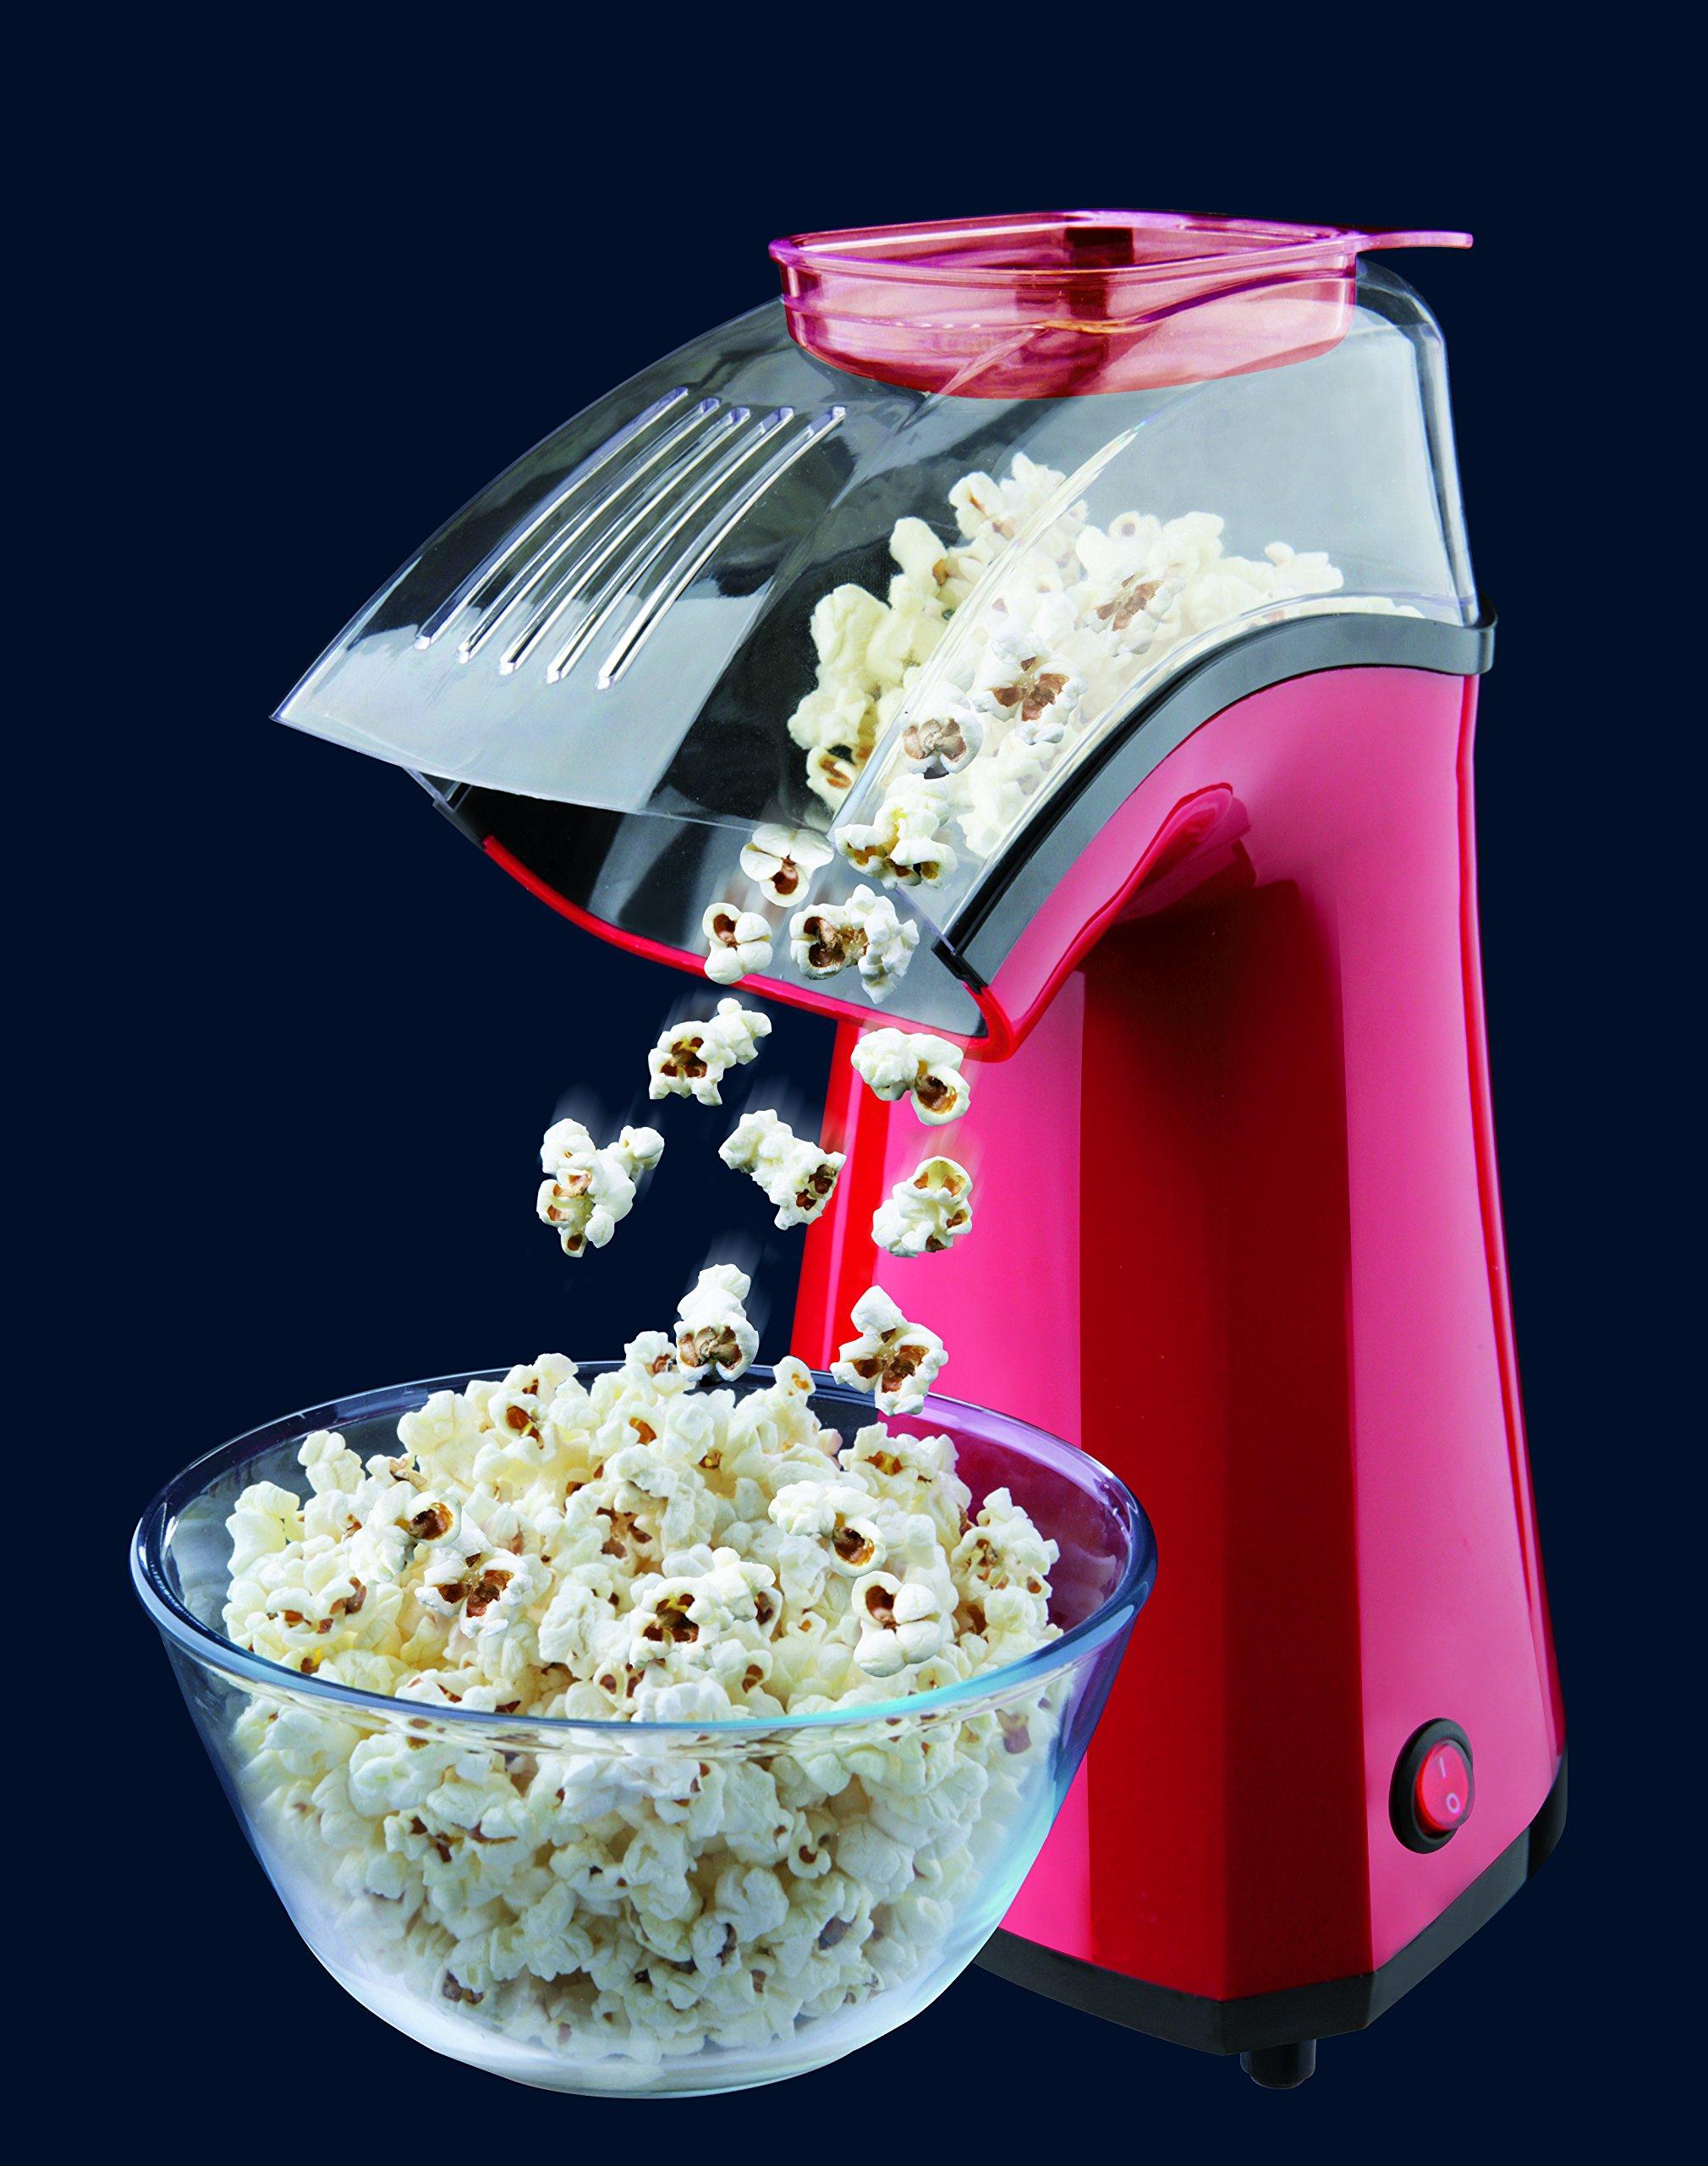 Taurus PopNCorn Máquina para hacer palomitas, 1100 W, Plástico, Rojo: Taurus: Amazon.es: Hogar